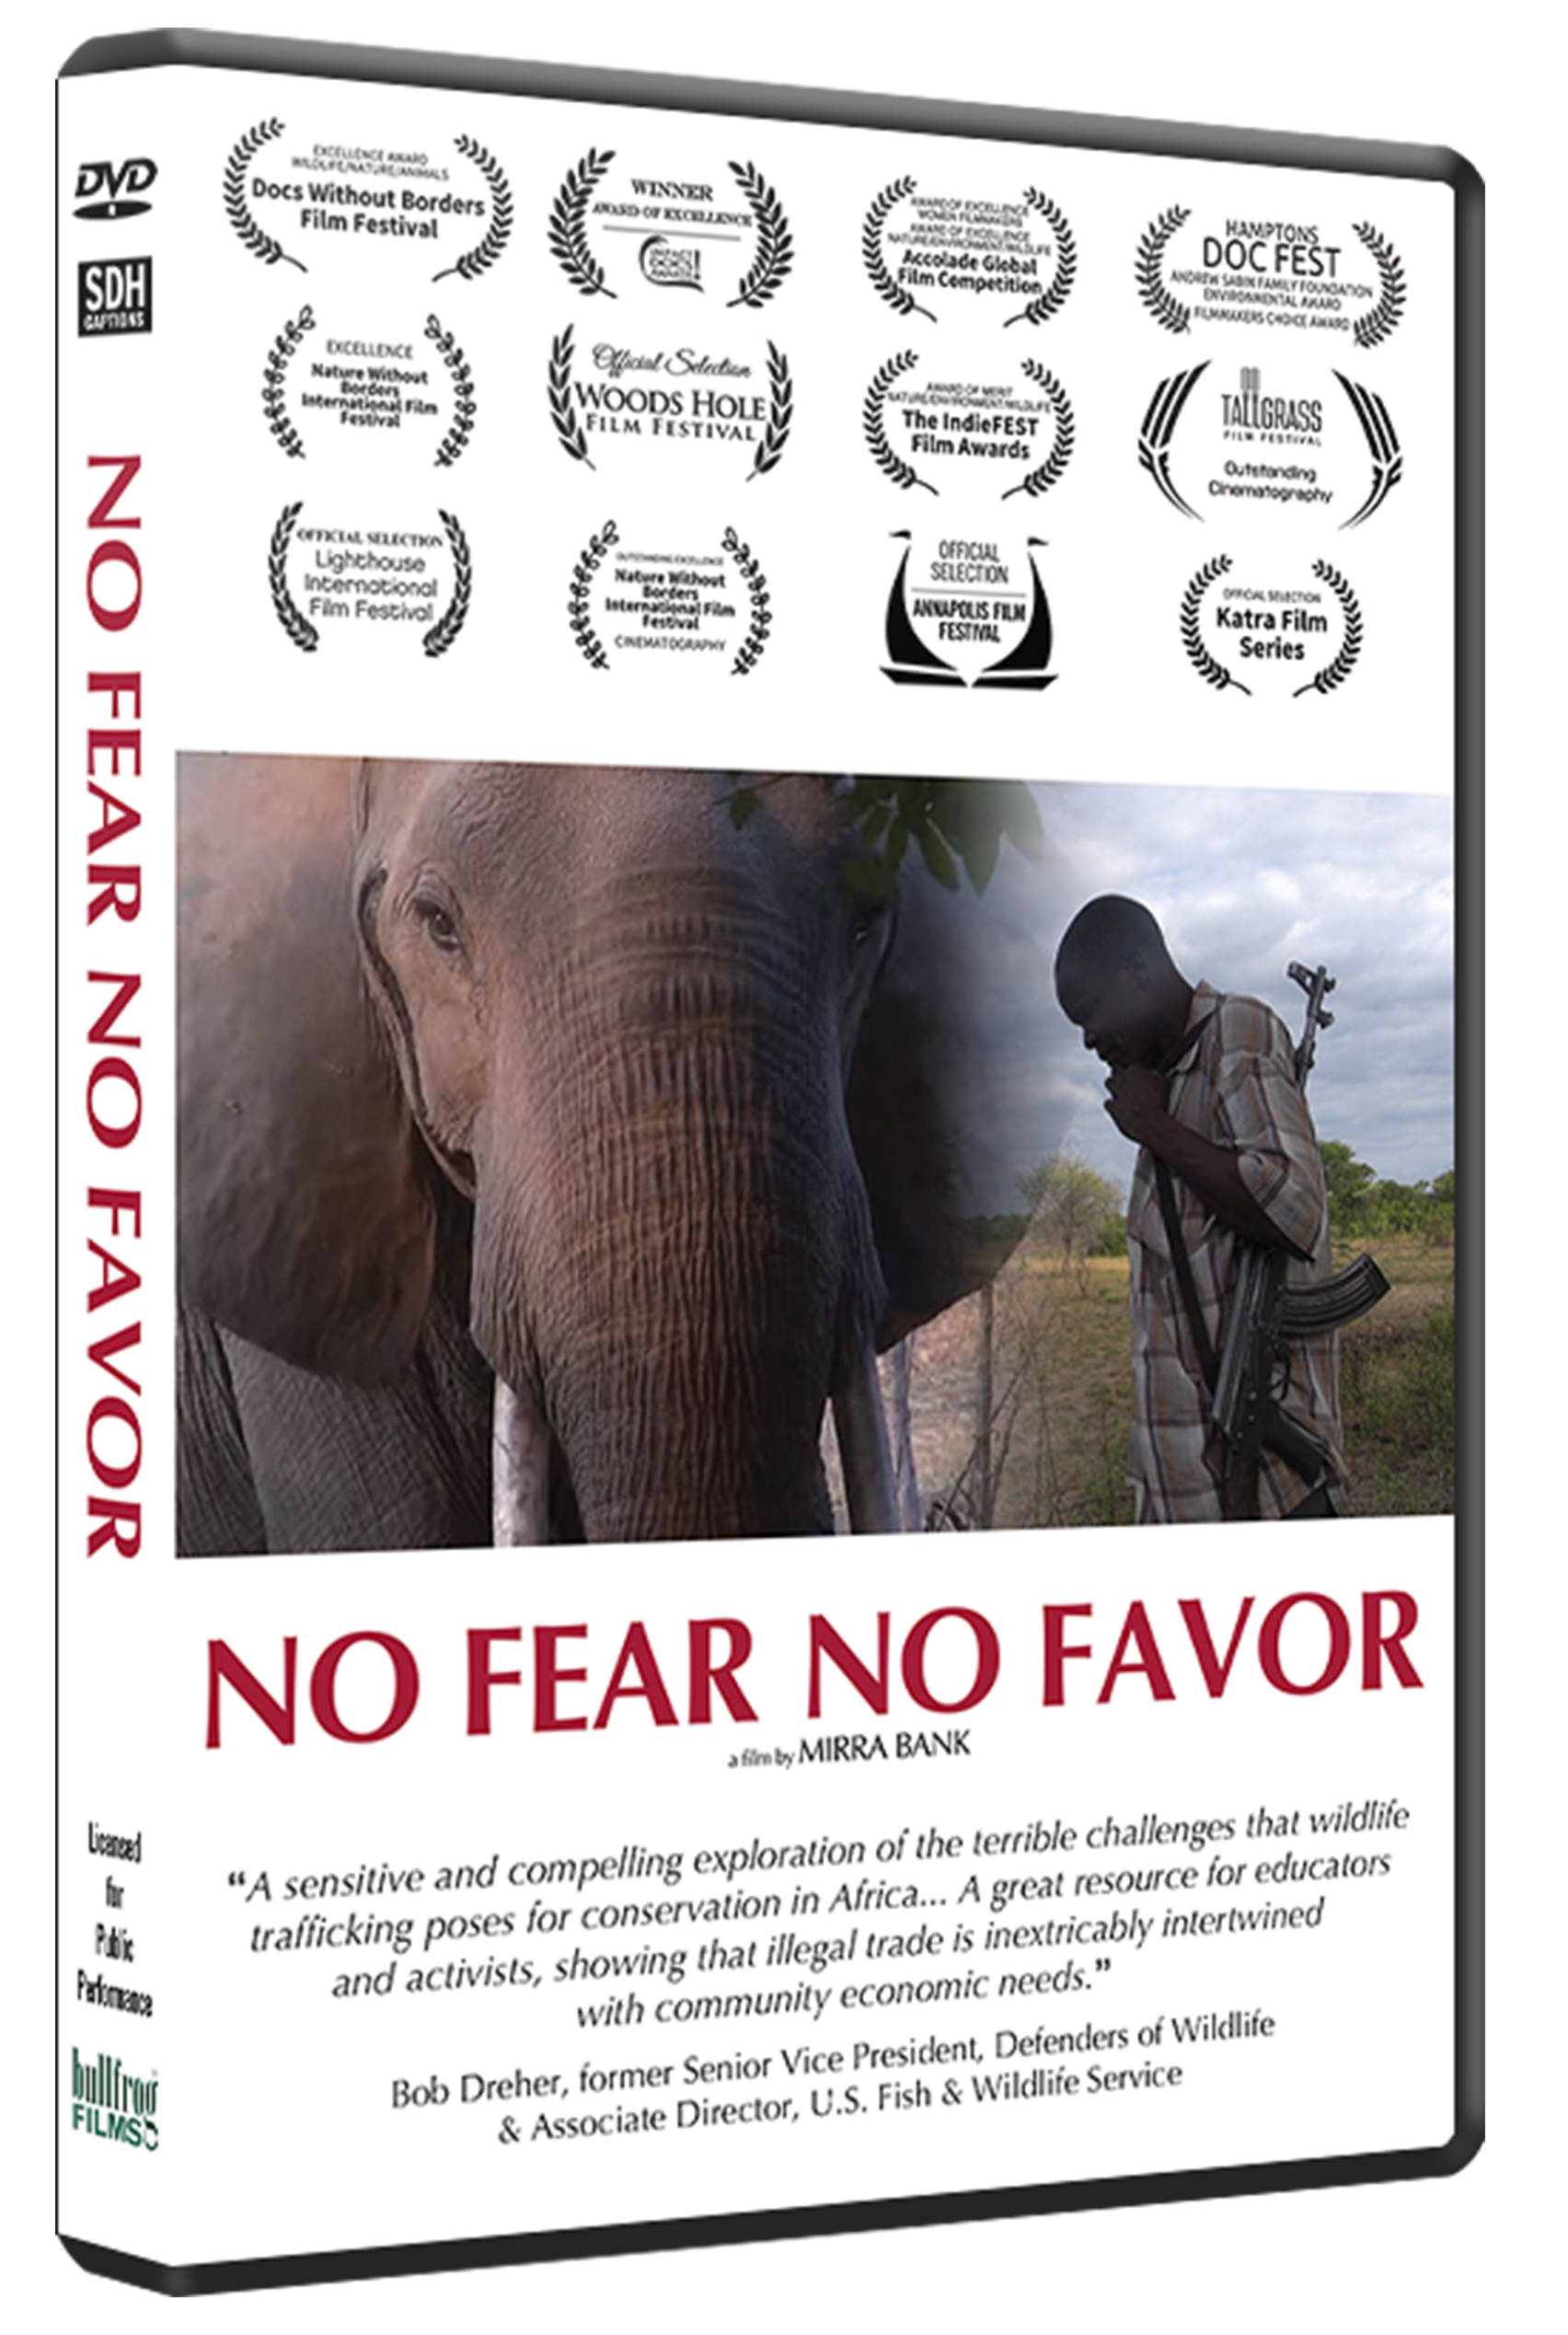 NO FEAR NO FAVOR